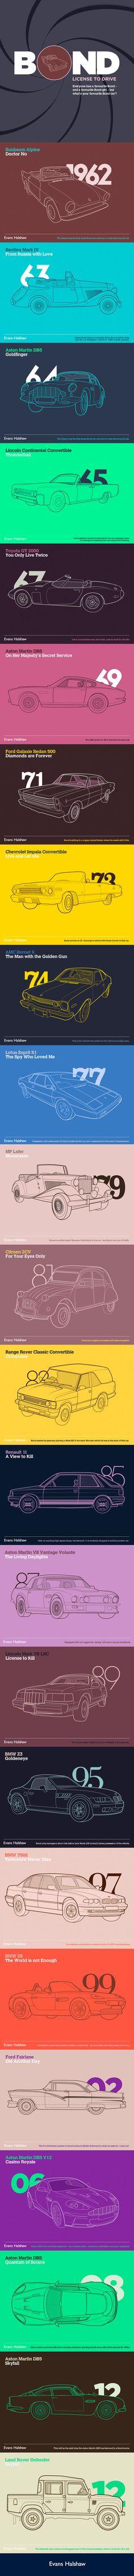 An illustrated history of James Bond's cars drive, art, james bond, automobil, bond car, 007, infographic illustration, design, jame bond